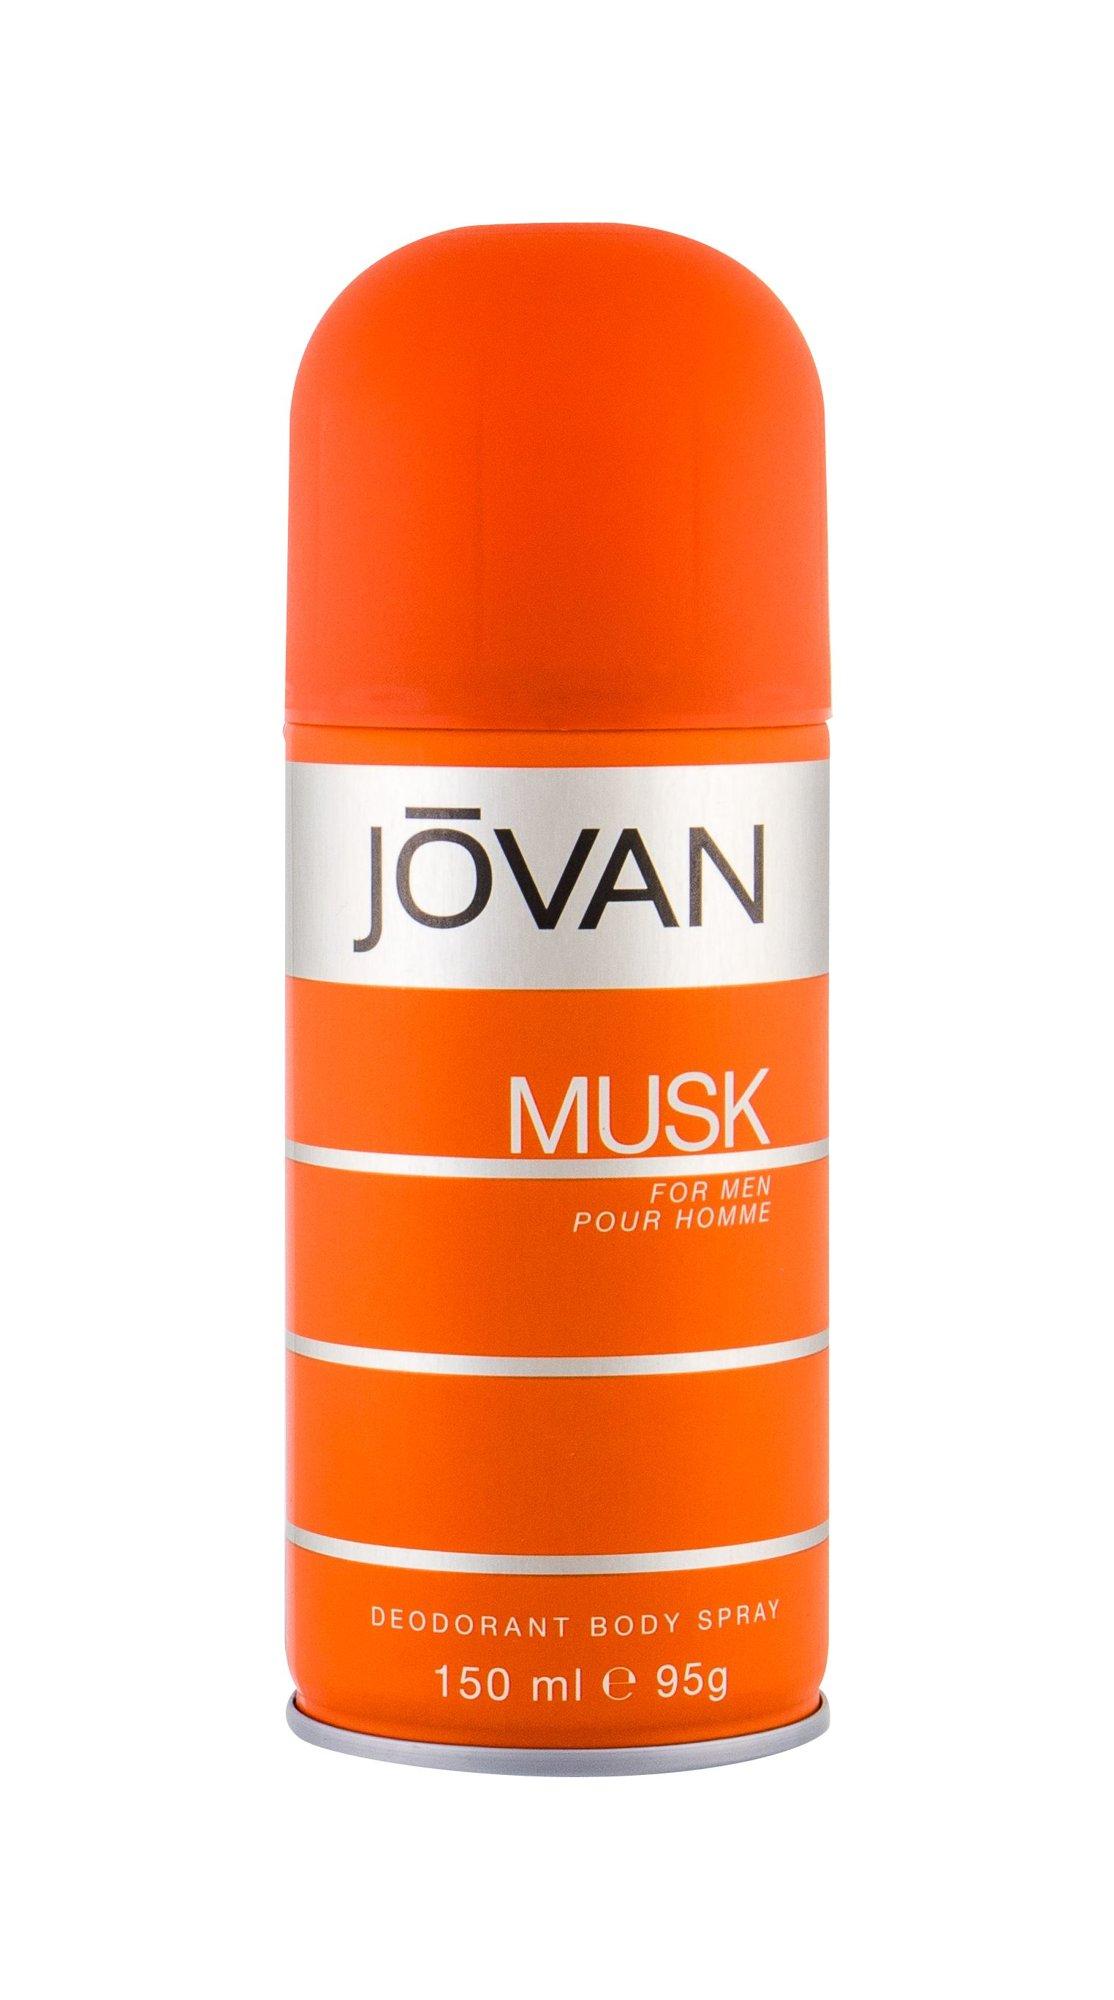 Jovan Musk Deodorant 150ml